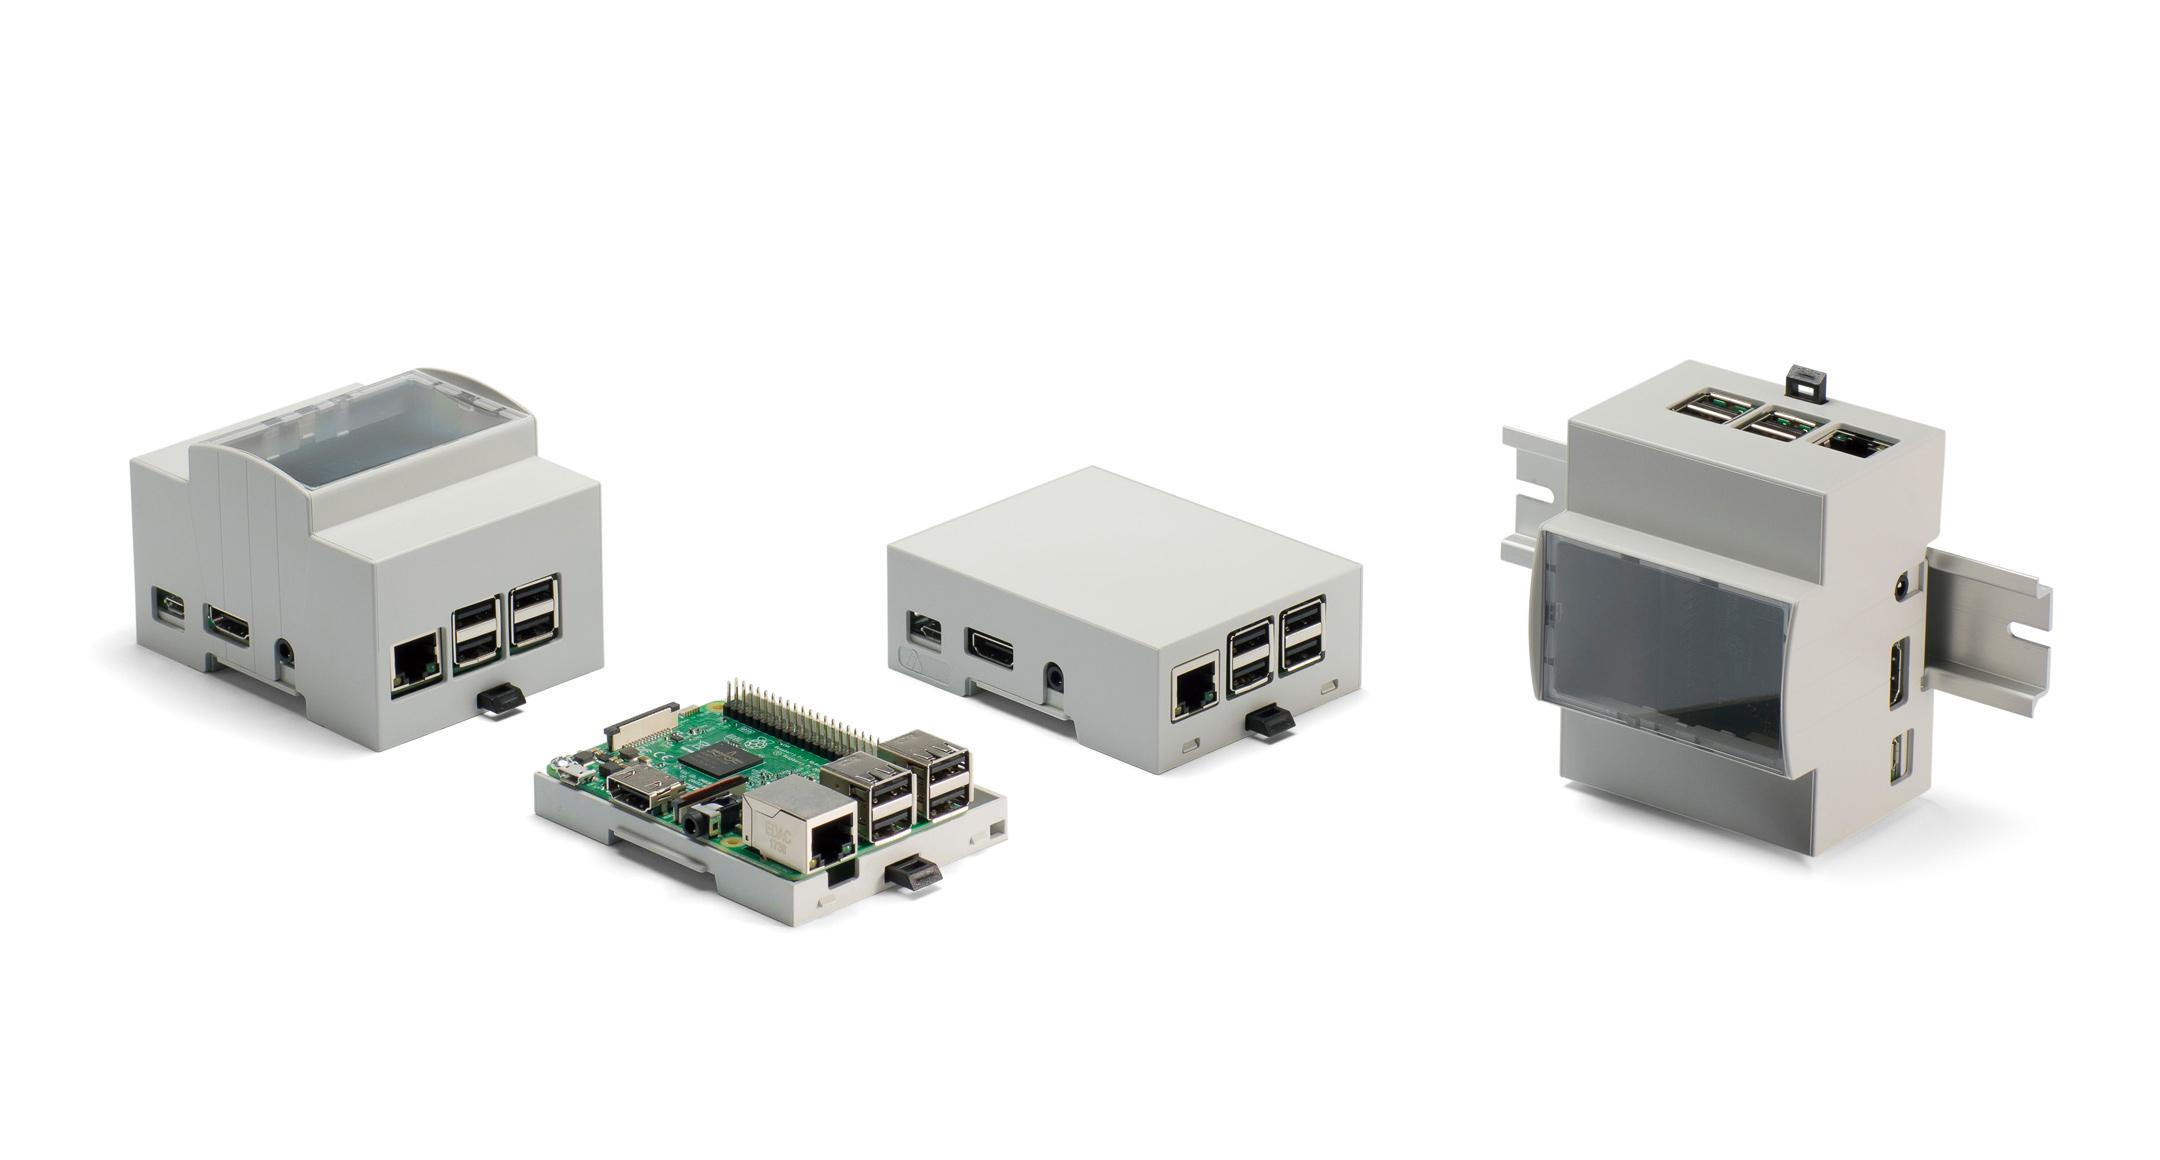 Raspberry Pi 2B/3B DINレールボックス RPDシリーズの画像